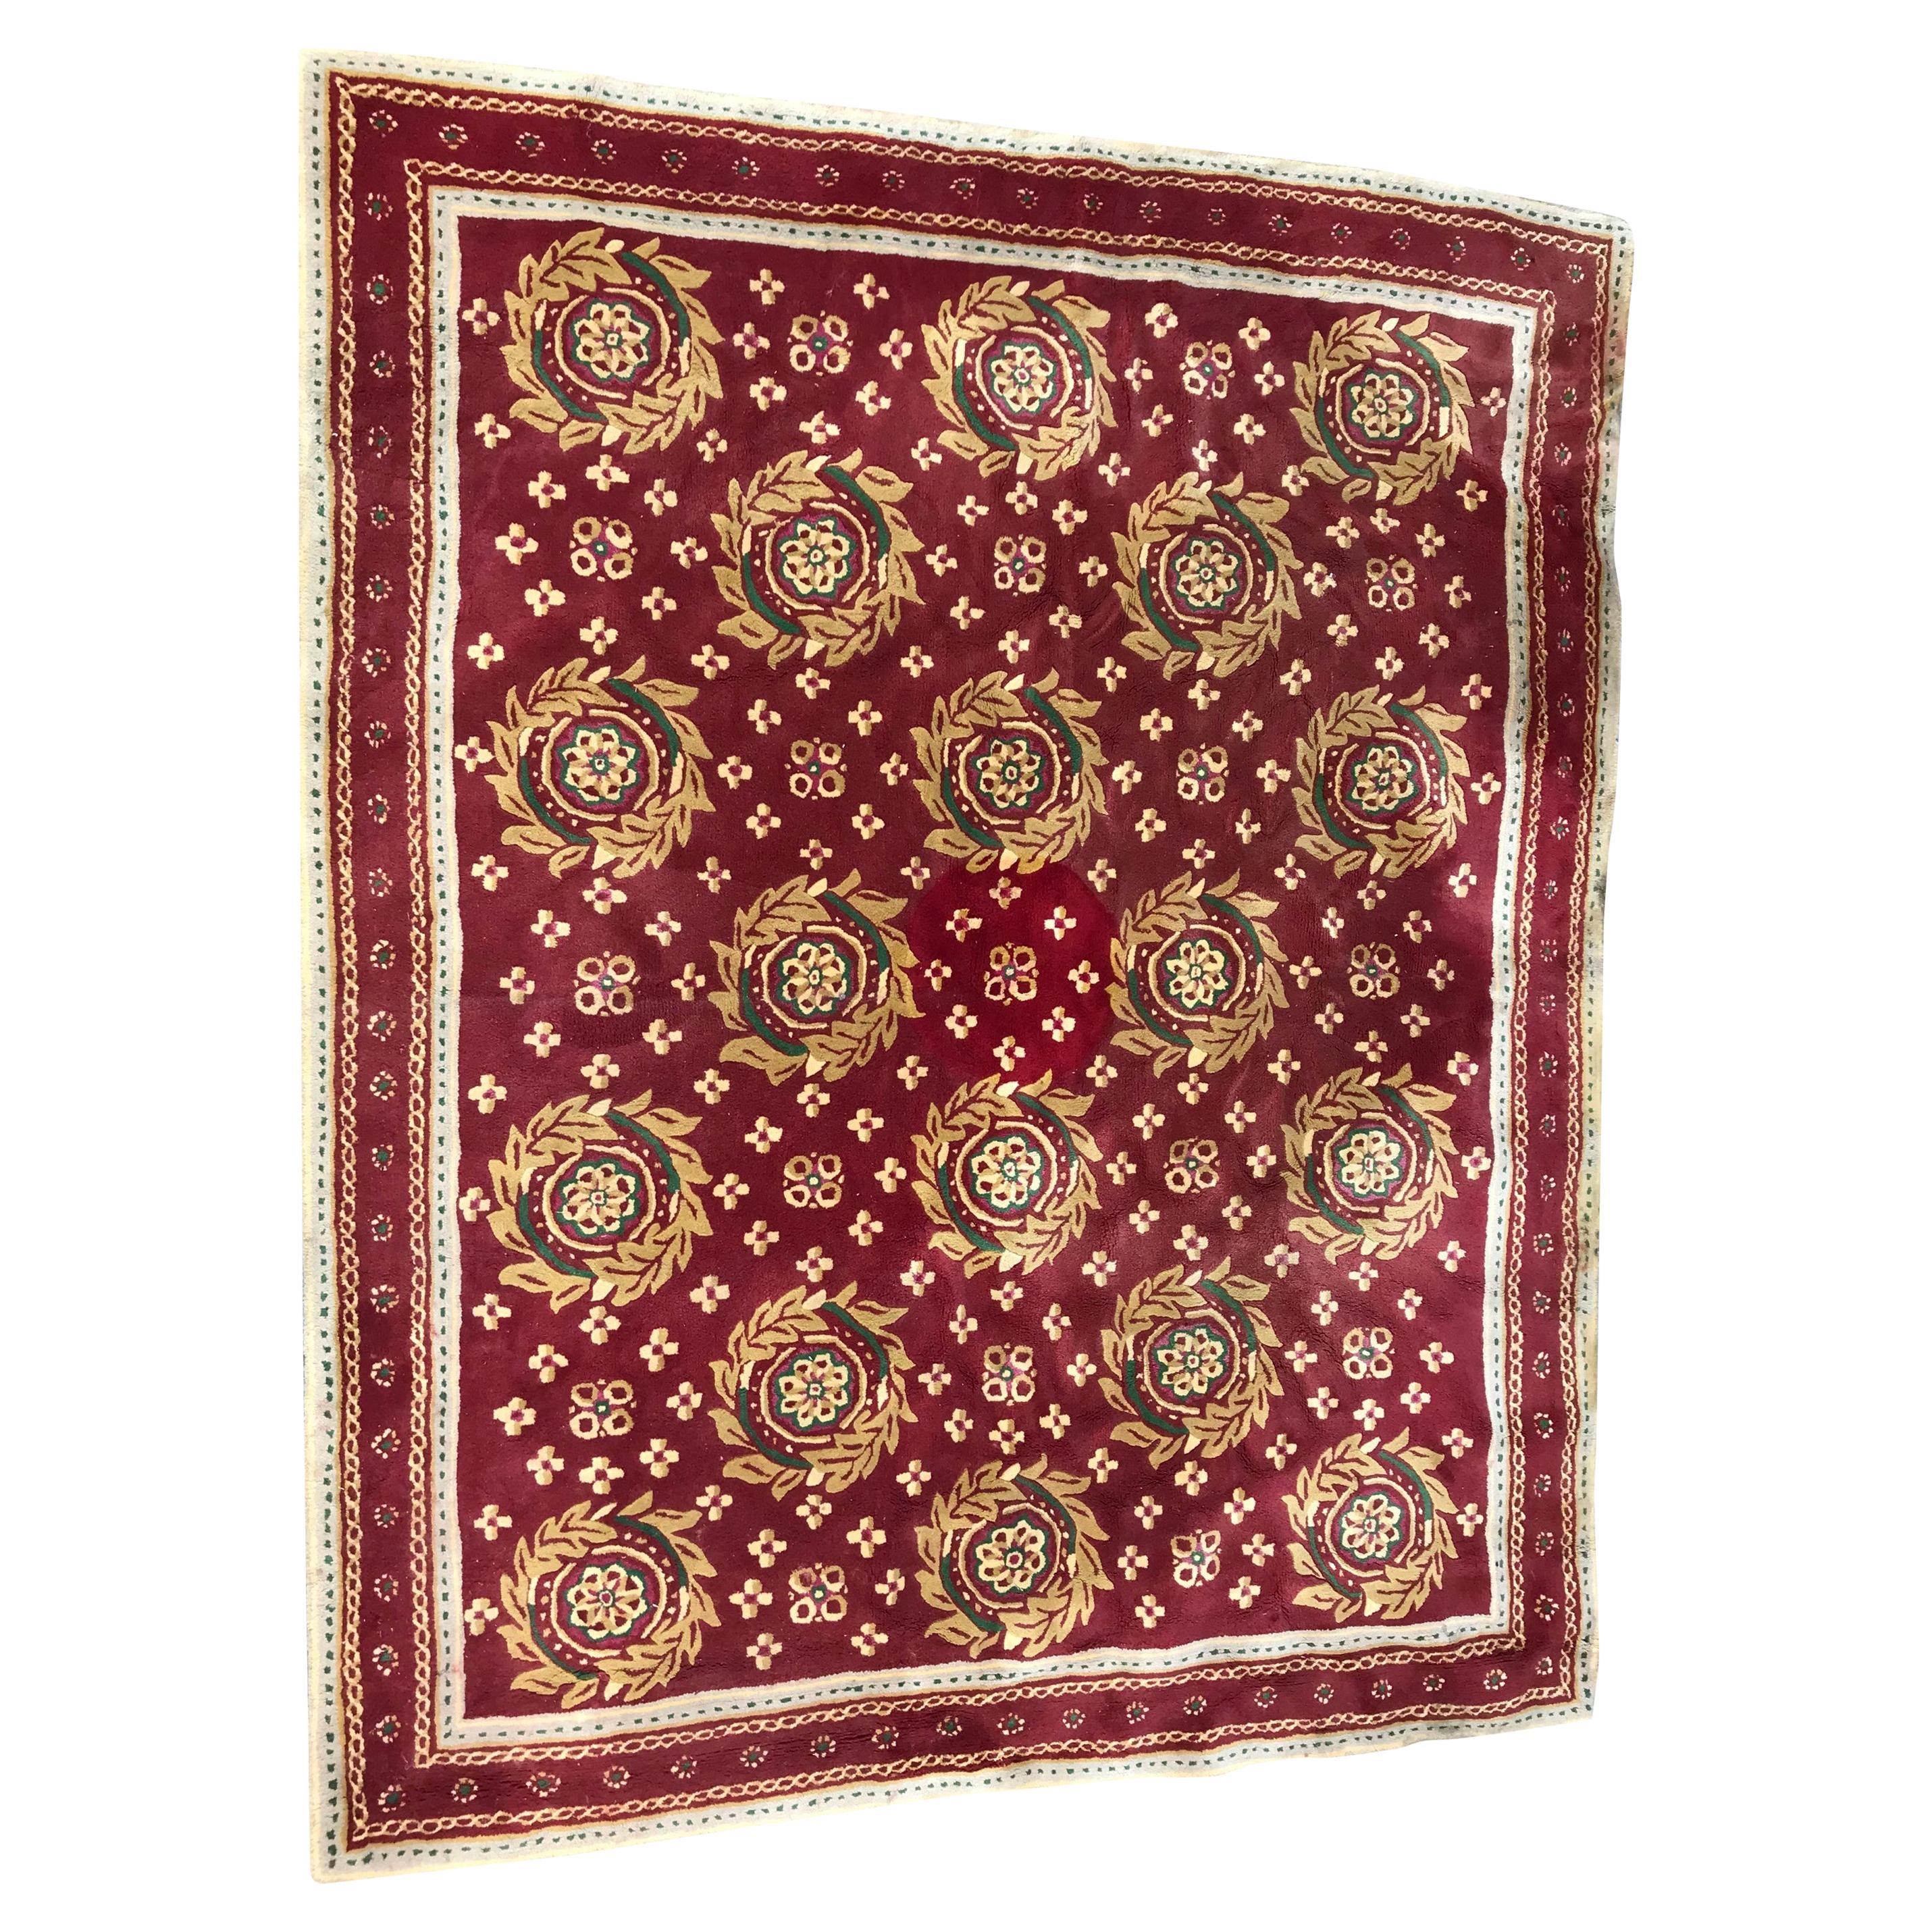 Beautiful Vintage Aubusson Design Hand Tufted Rug